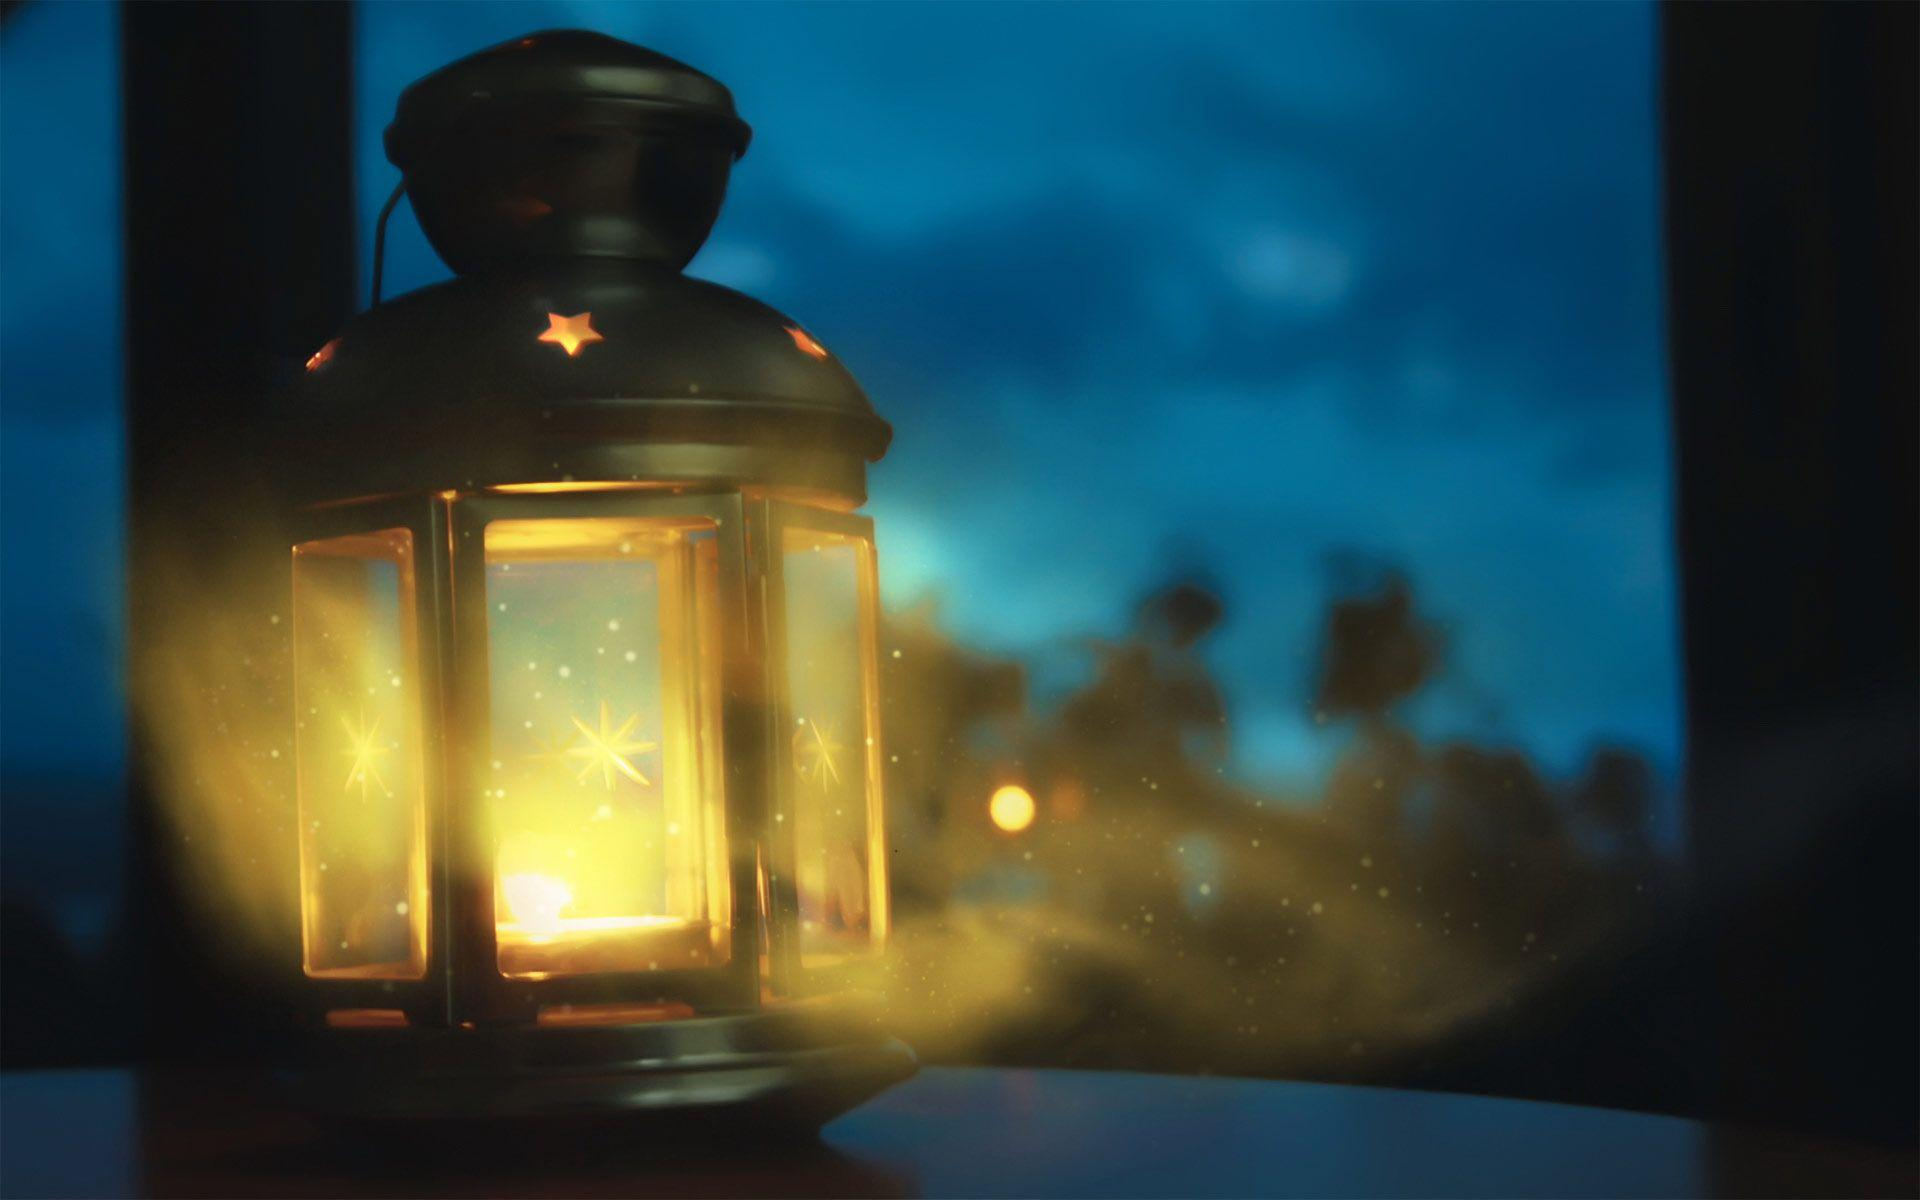 The fireflies Dengzhan wallpaper Auto desktop background ...